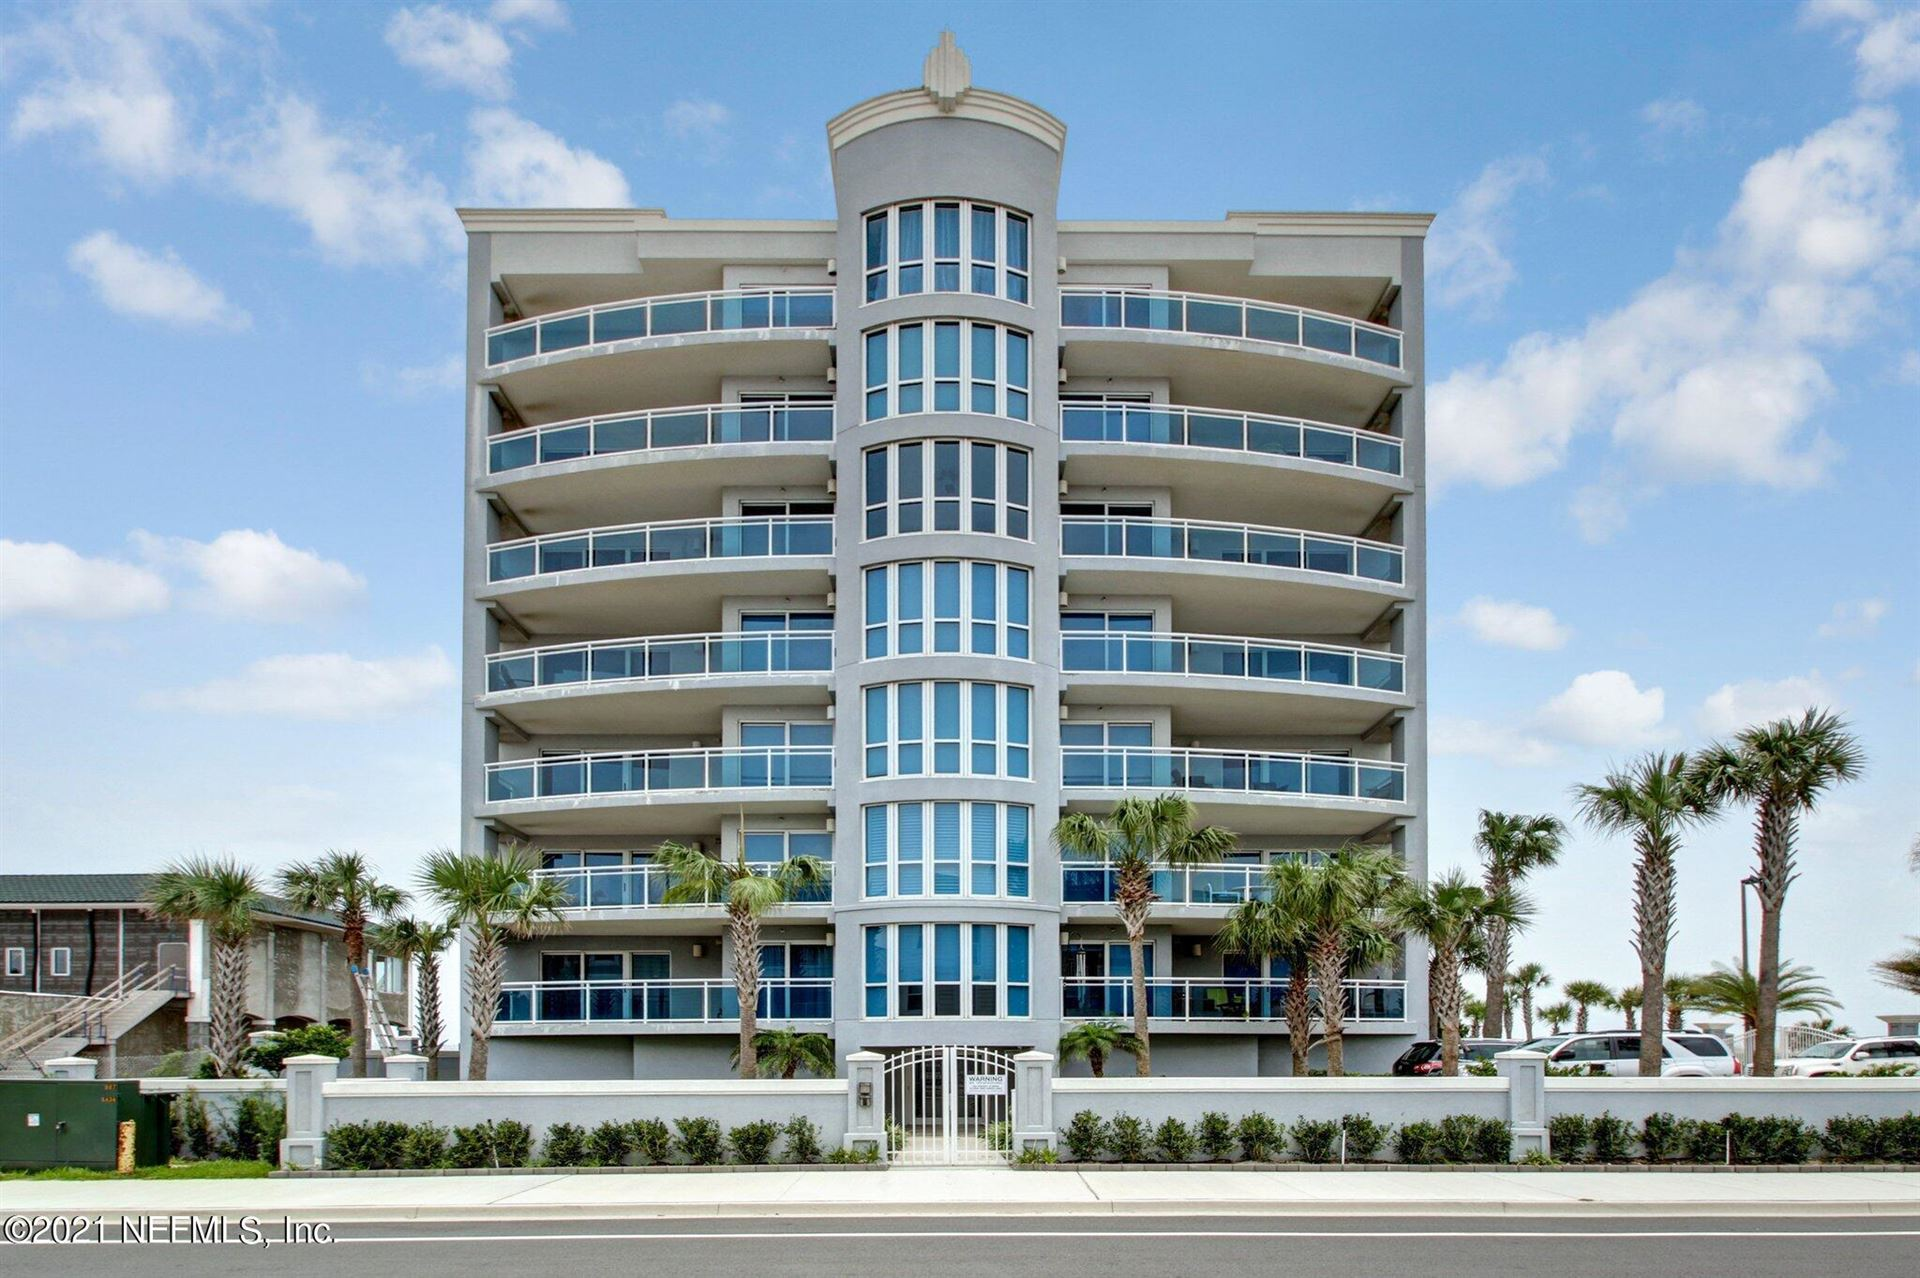 807 1ST ST N #Unit No: 201, Jacksonville Beach, FL 32250 - MLS#: 1100535